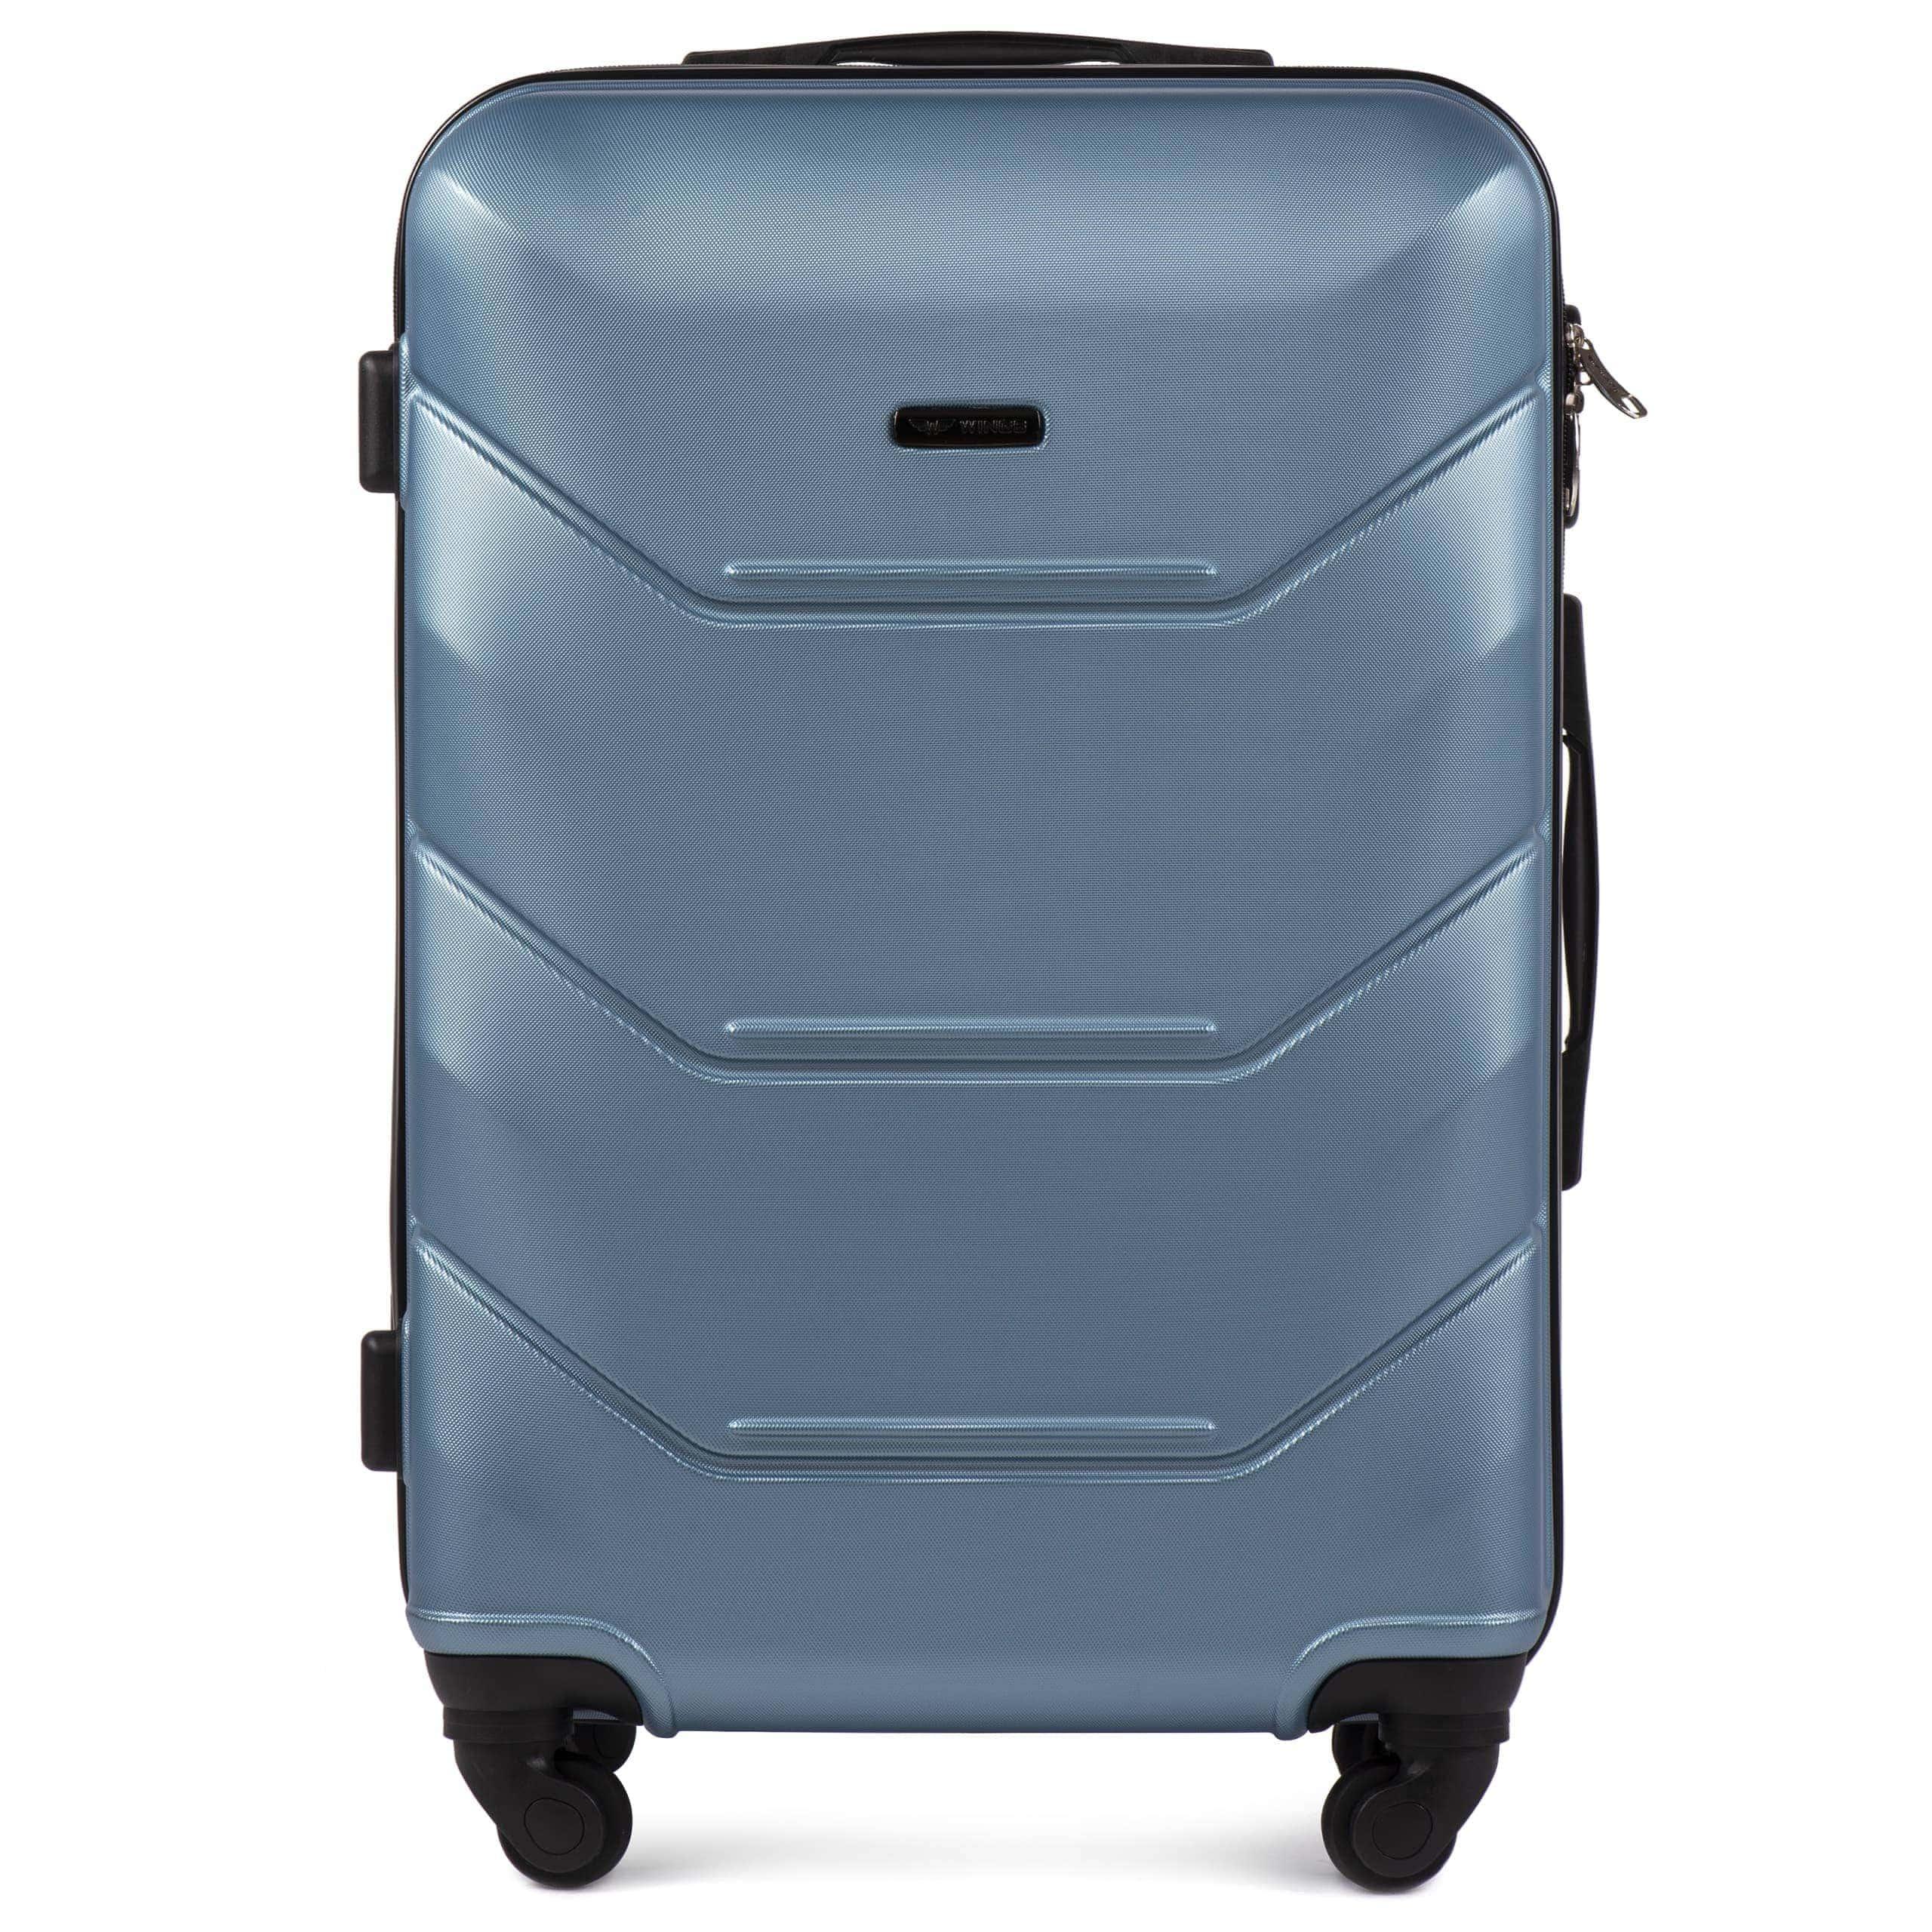 Valiza mare WINGS 147 L BLUE-SILVER Premium pe 4 roti din cauciuc!Pt bagaj,pina la 23 kg